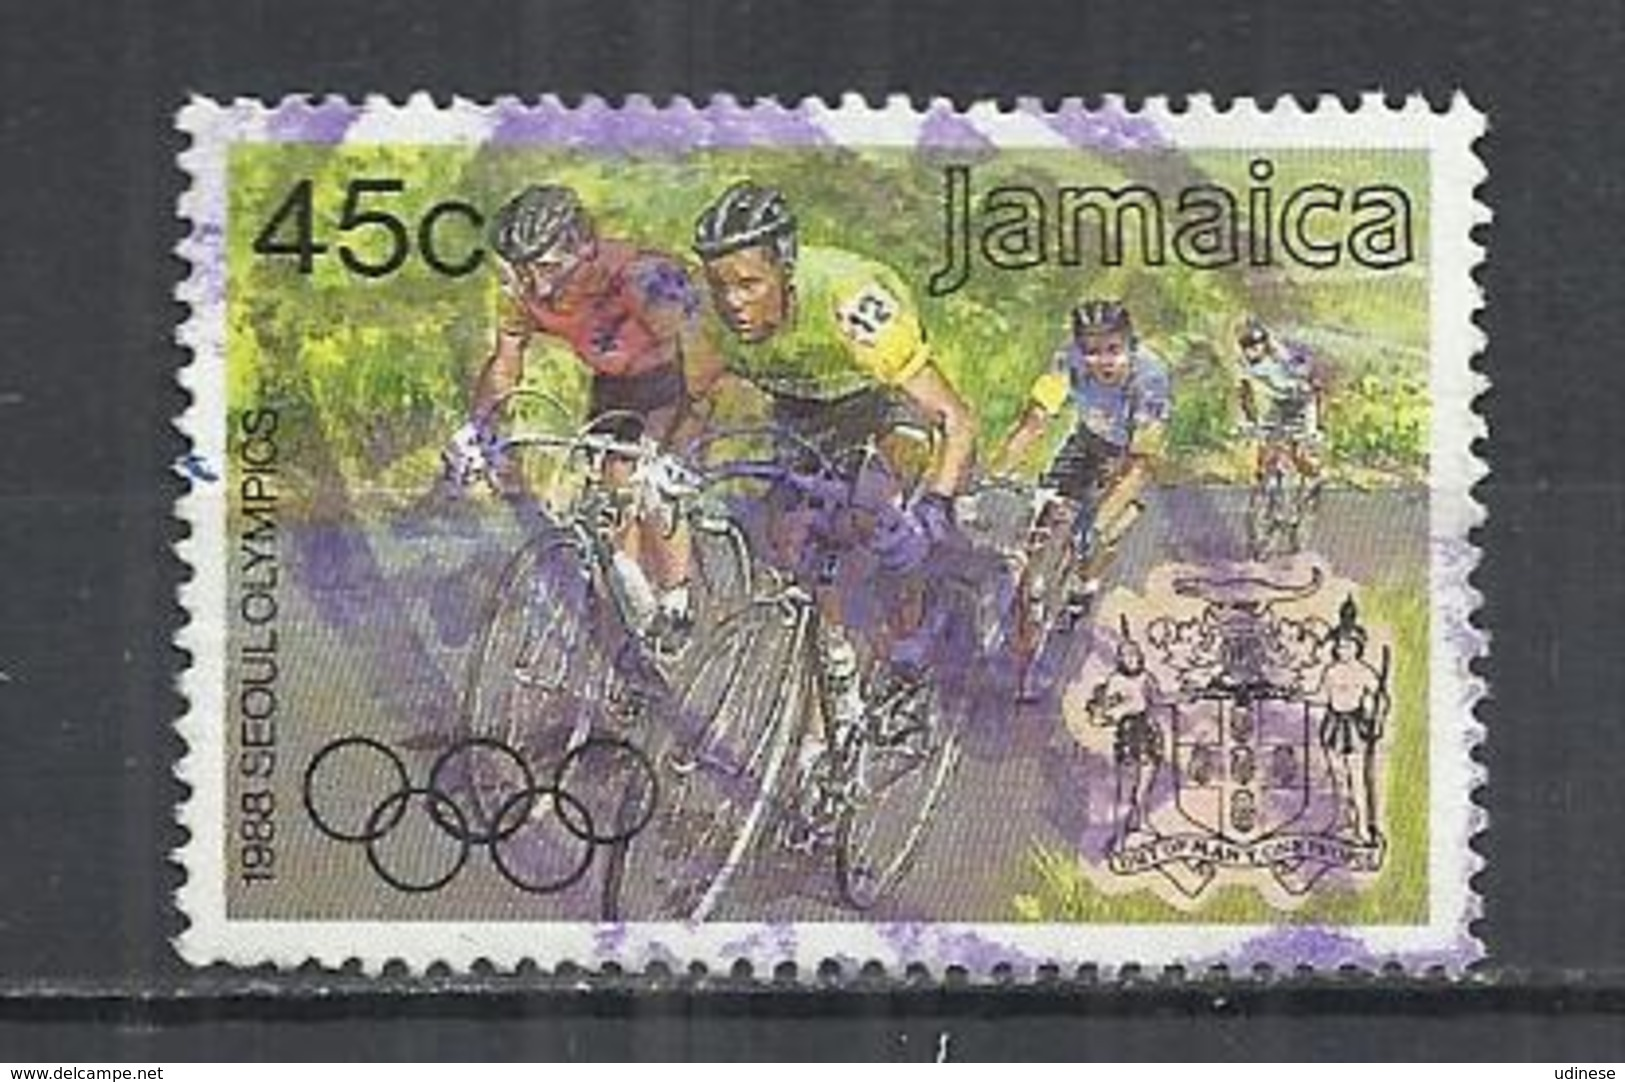 JAMAICA 1988 - OLYMPIC GAMES - POSTALLY  USED OBLITERE GESTEMPELT USADO - Ete 1988: Séoul